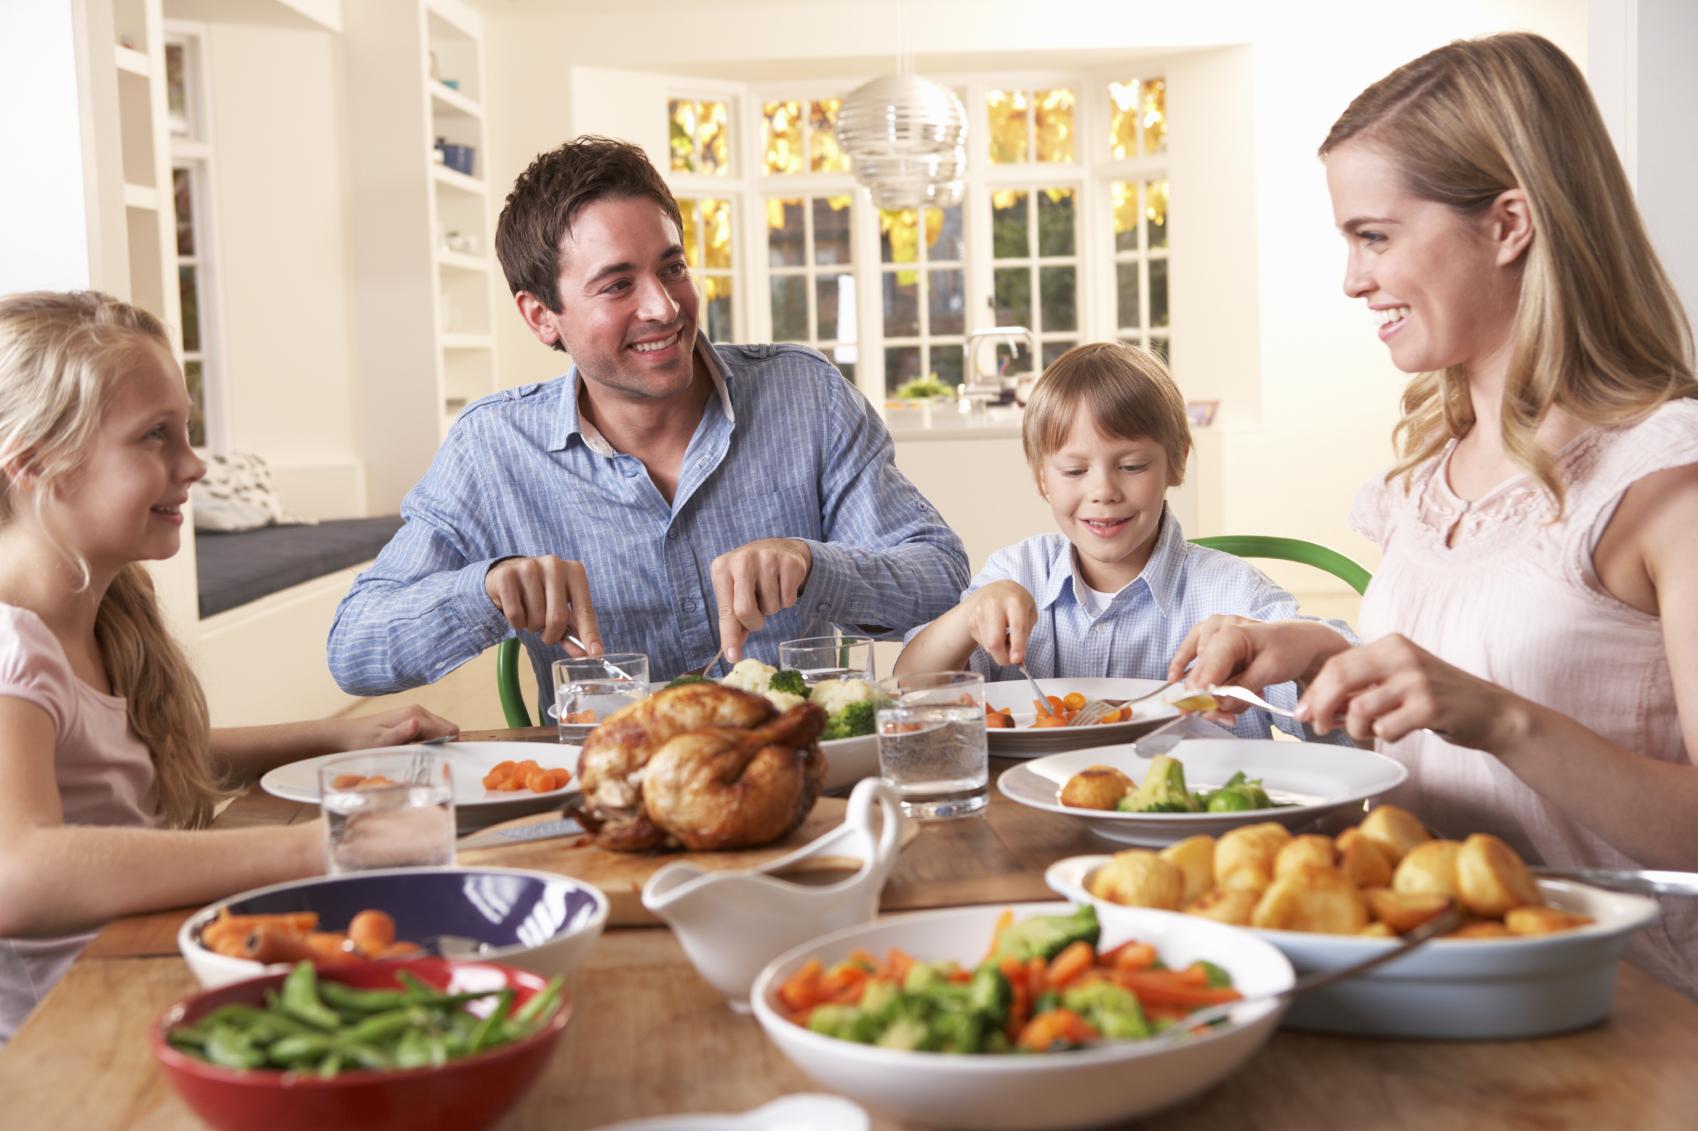 Make a Meal Program